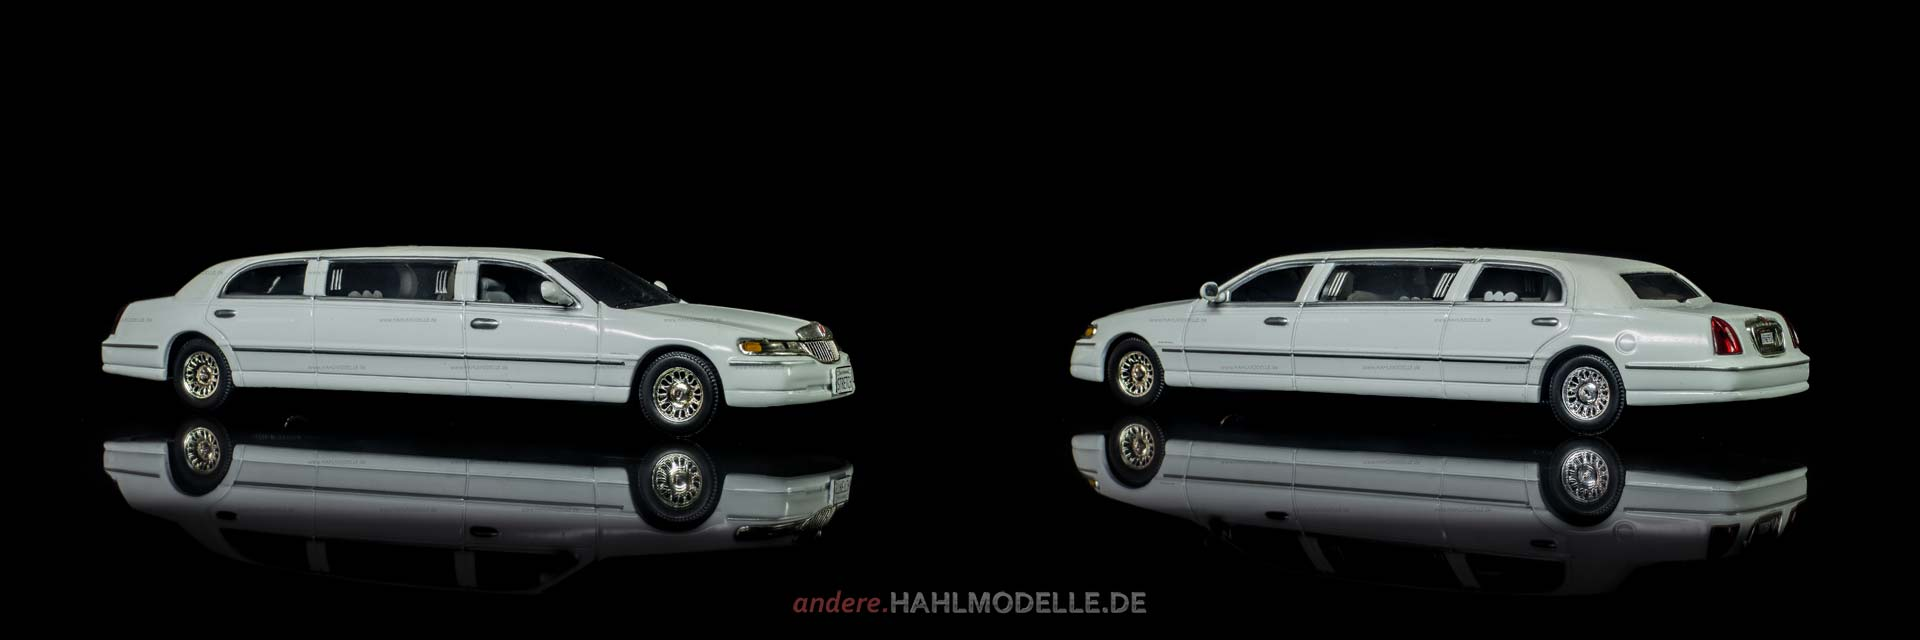 Lincoln Town Car | Stretch-Limousine | Sun Star | 1:43 | www.andere.hahlmodelle.de